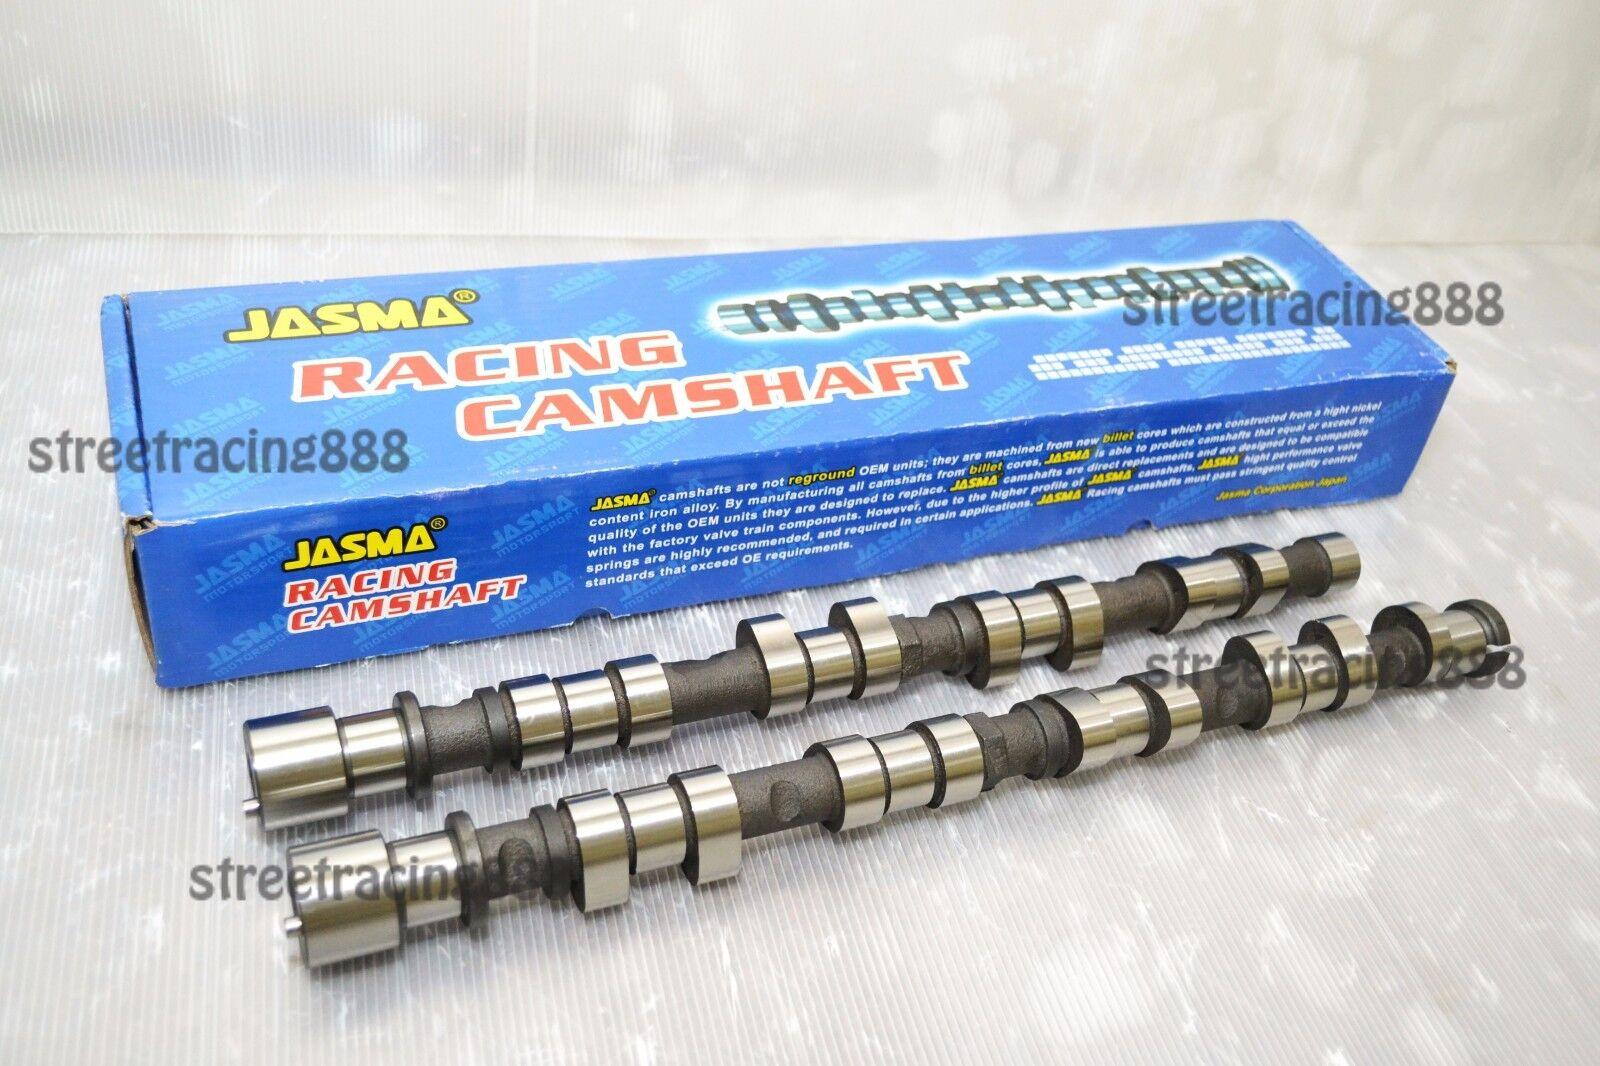 Jasma Racing Camshaft Cam Gear 4g92 4g93 4g93t Proton Gti Dohc Ebay Mitsubishi Wiring Diagram